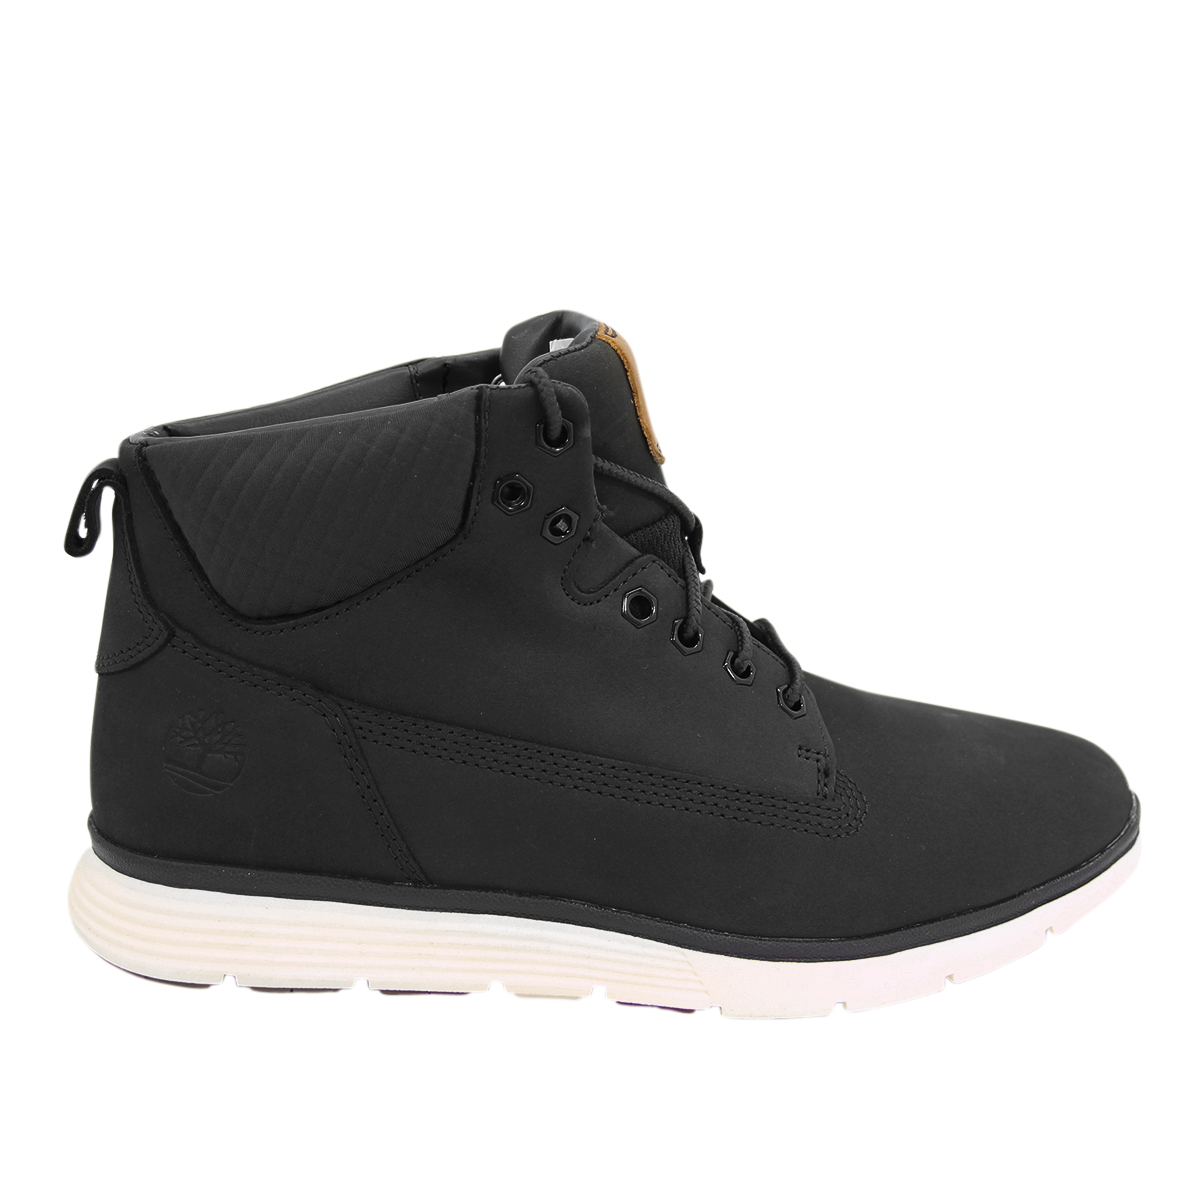 Timberland Killington Chukka Cuir Chaussures Hommes Neuf